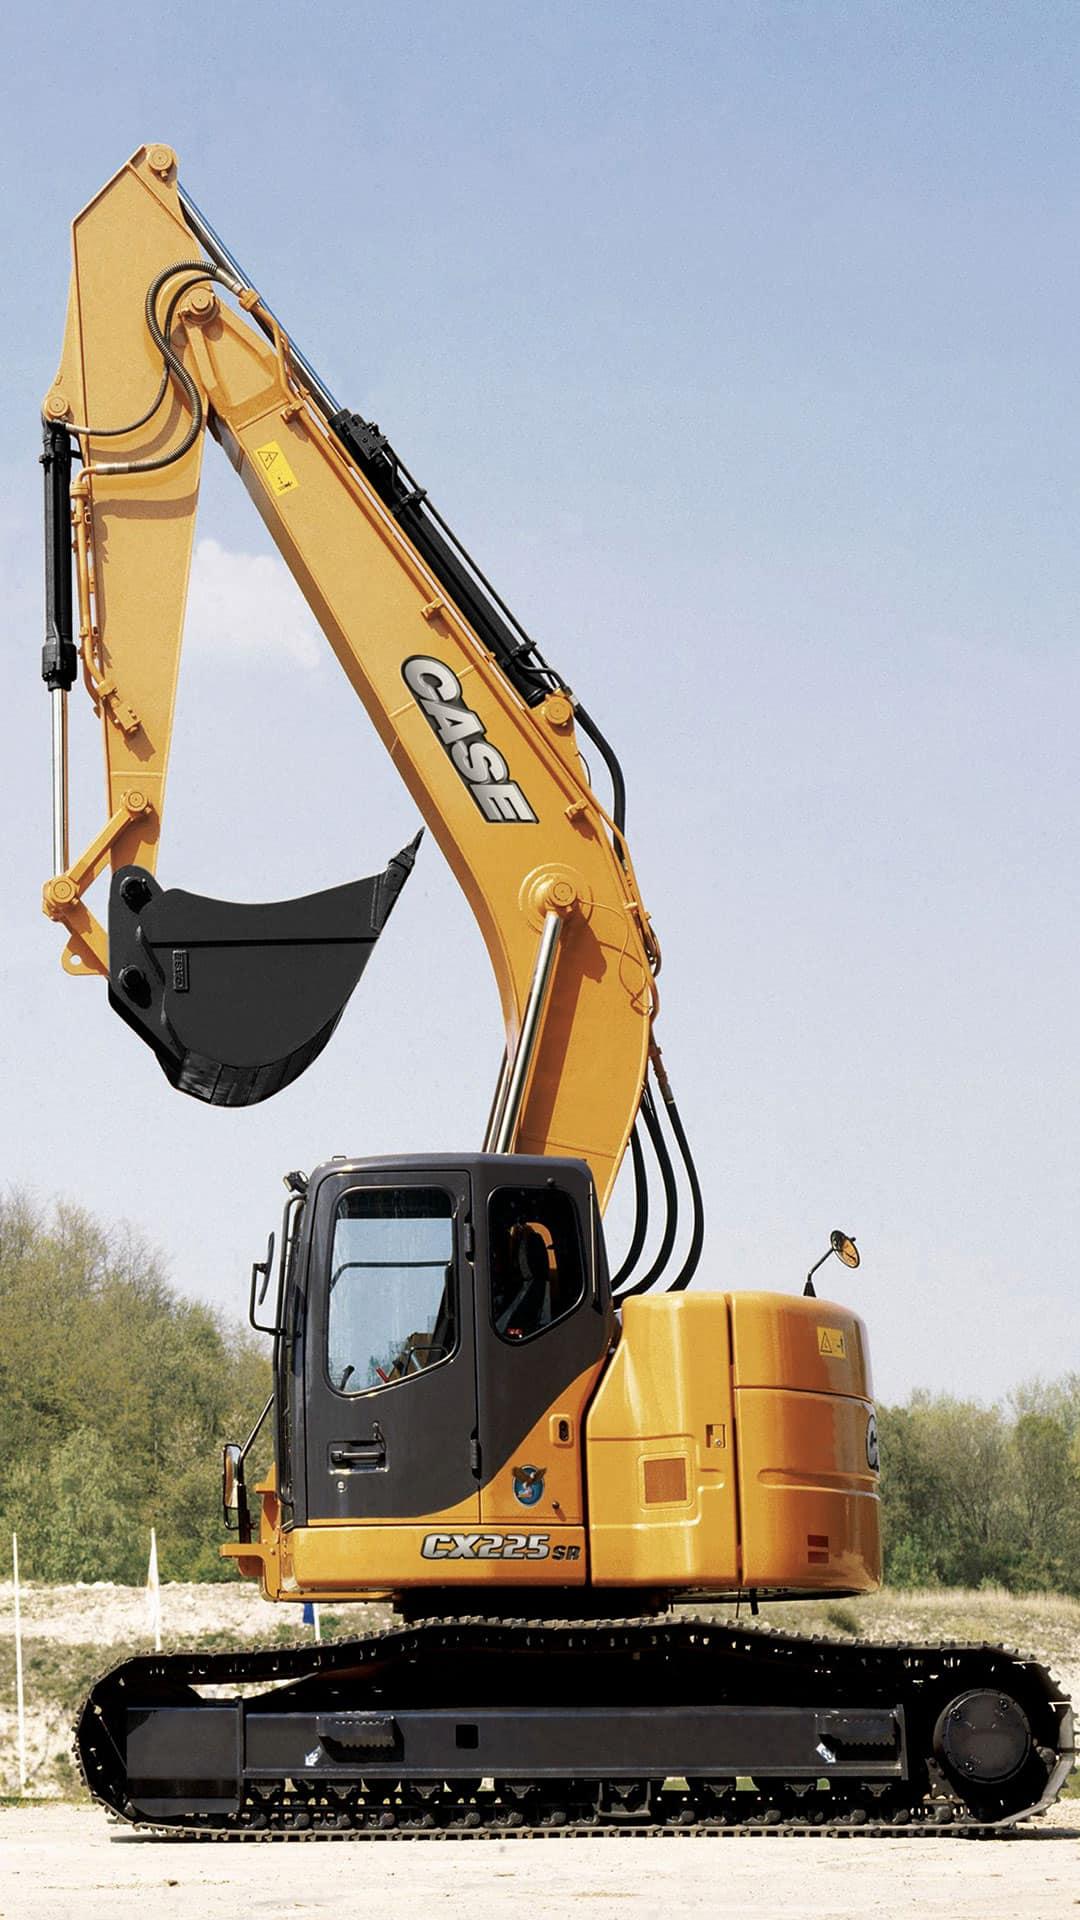 Cx225sr Large Sized Excavator Case